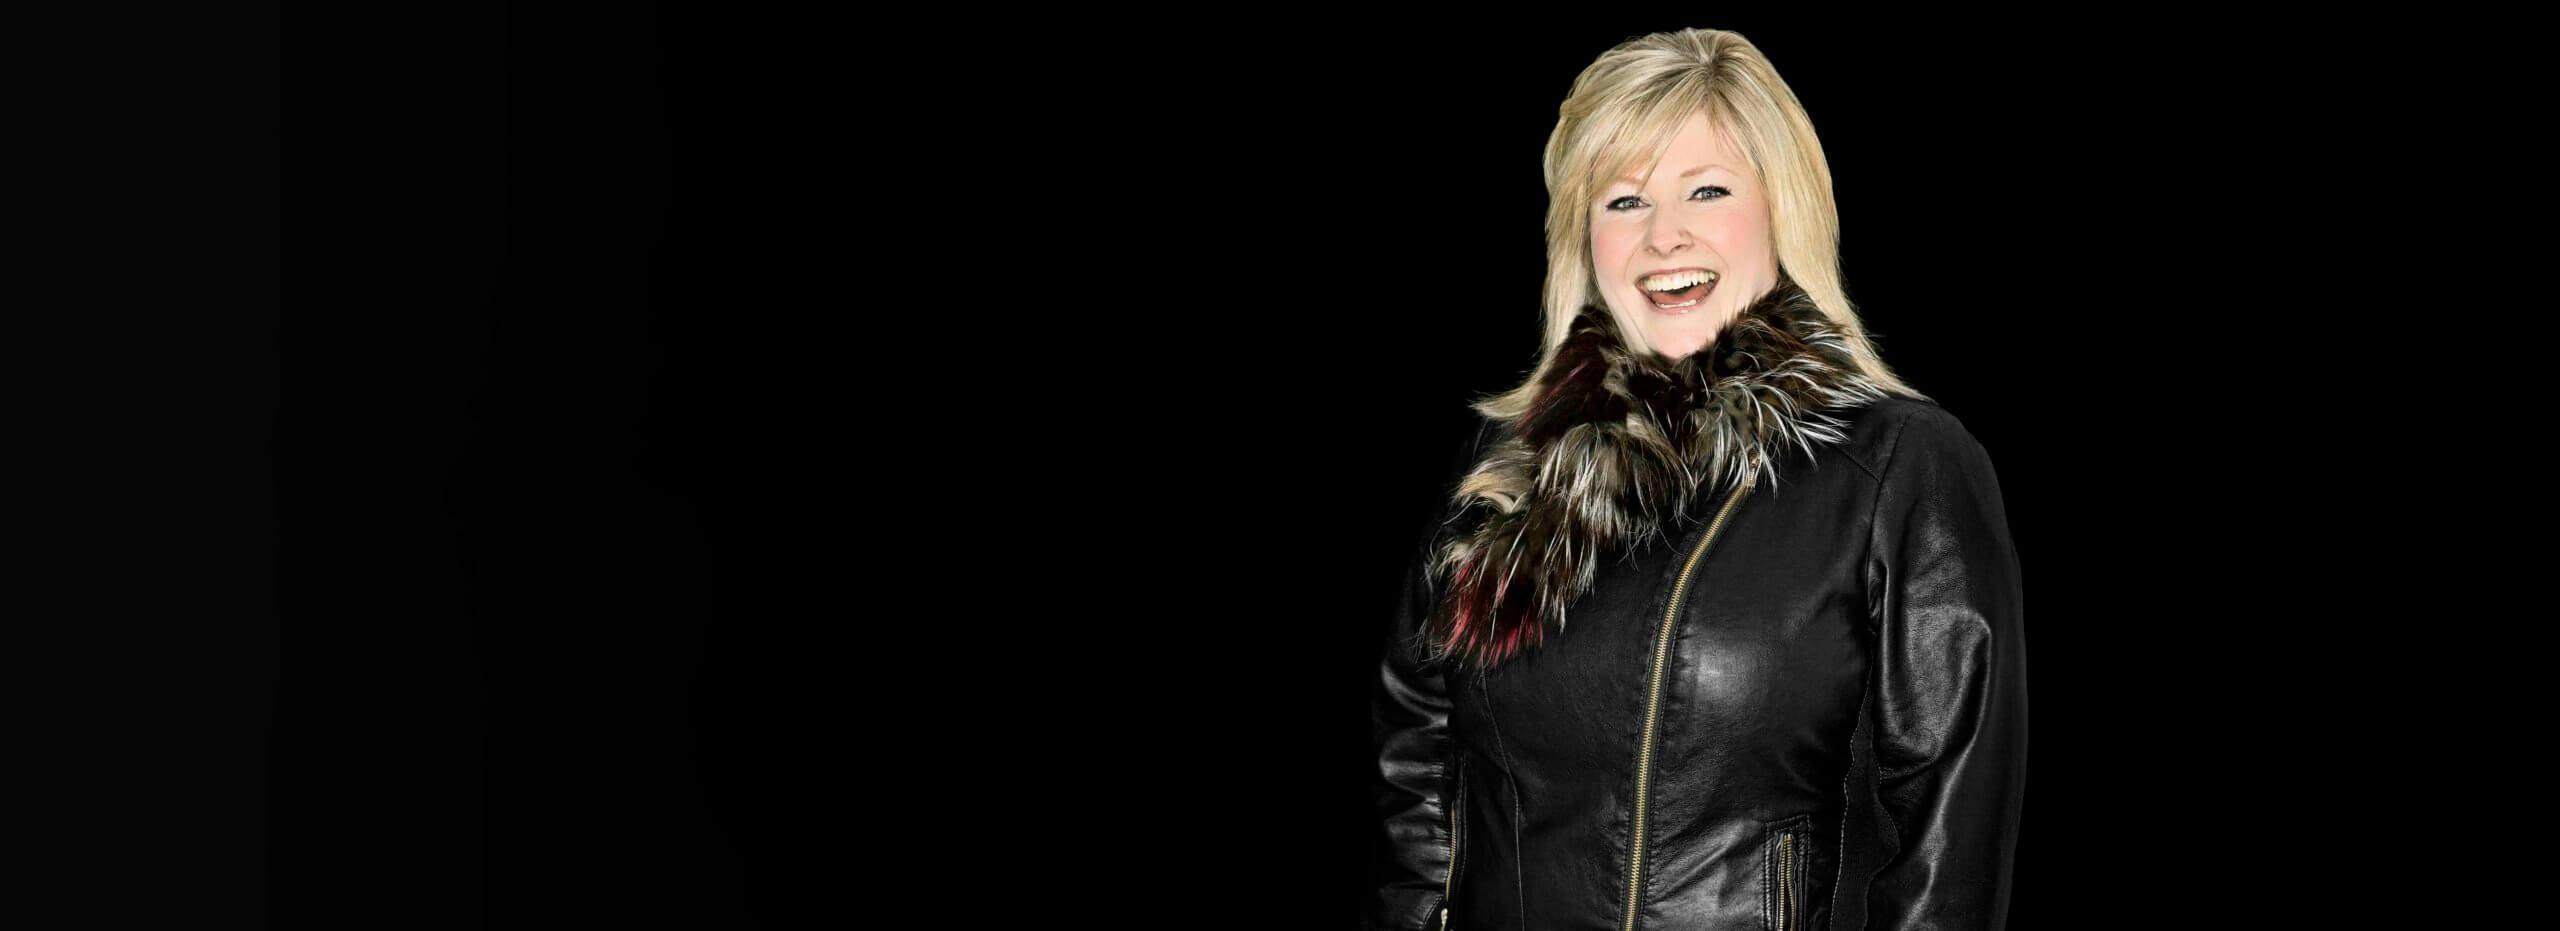 International Mezzo-Soprano Karen Cargill appointed Interim Head of Vocal Performance at Royal Conservatoire of Scotland Image